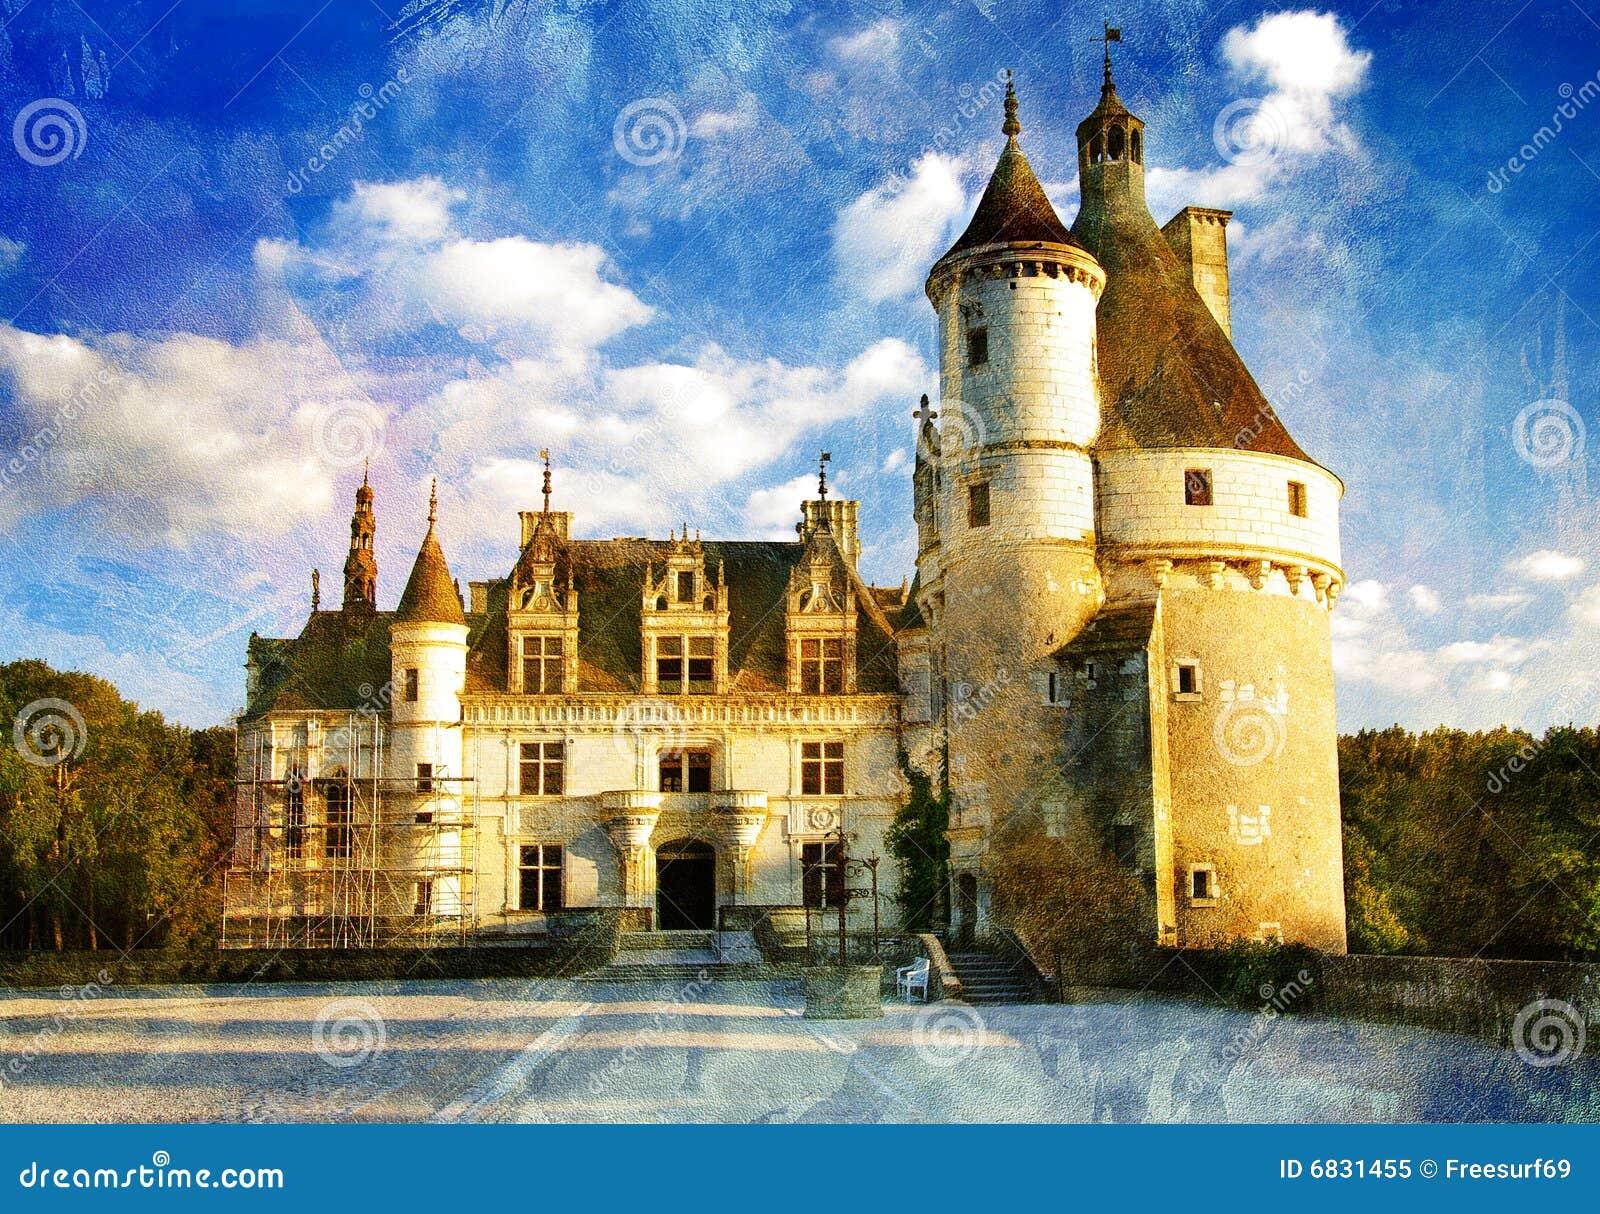 Chenonseau Castle - Painting Style Stock Illustration